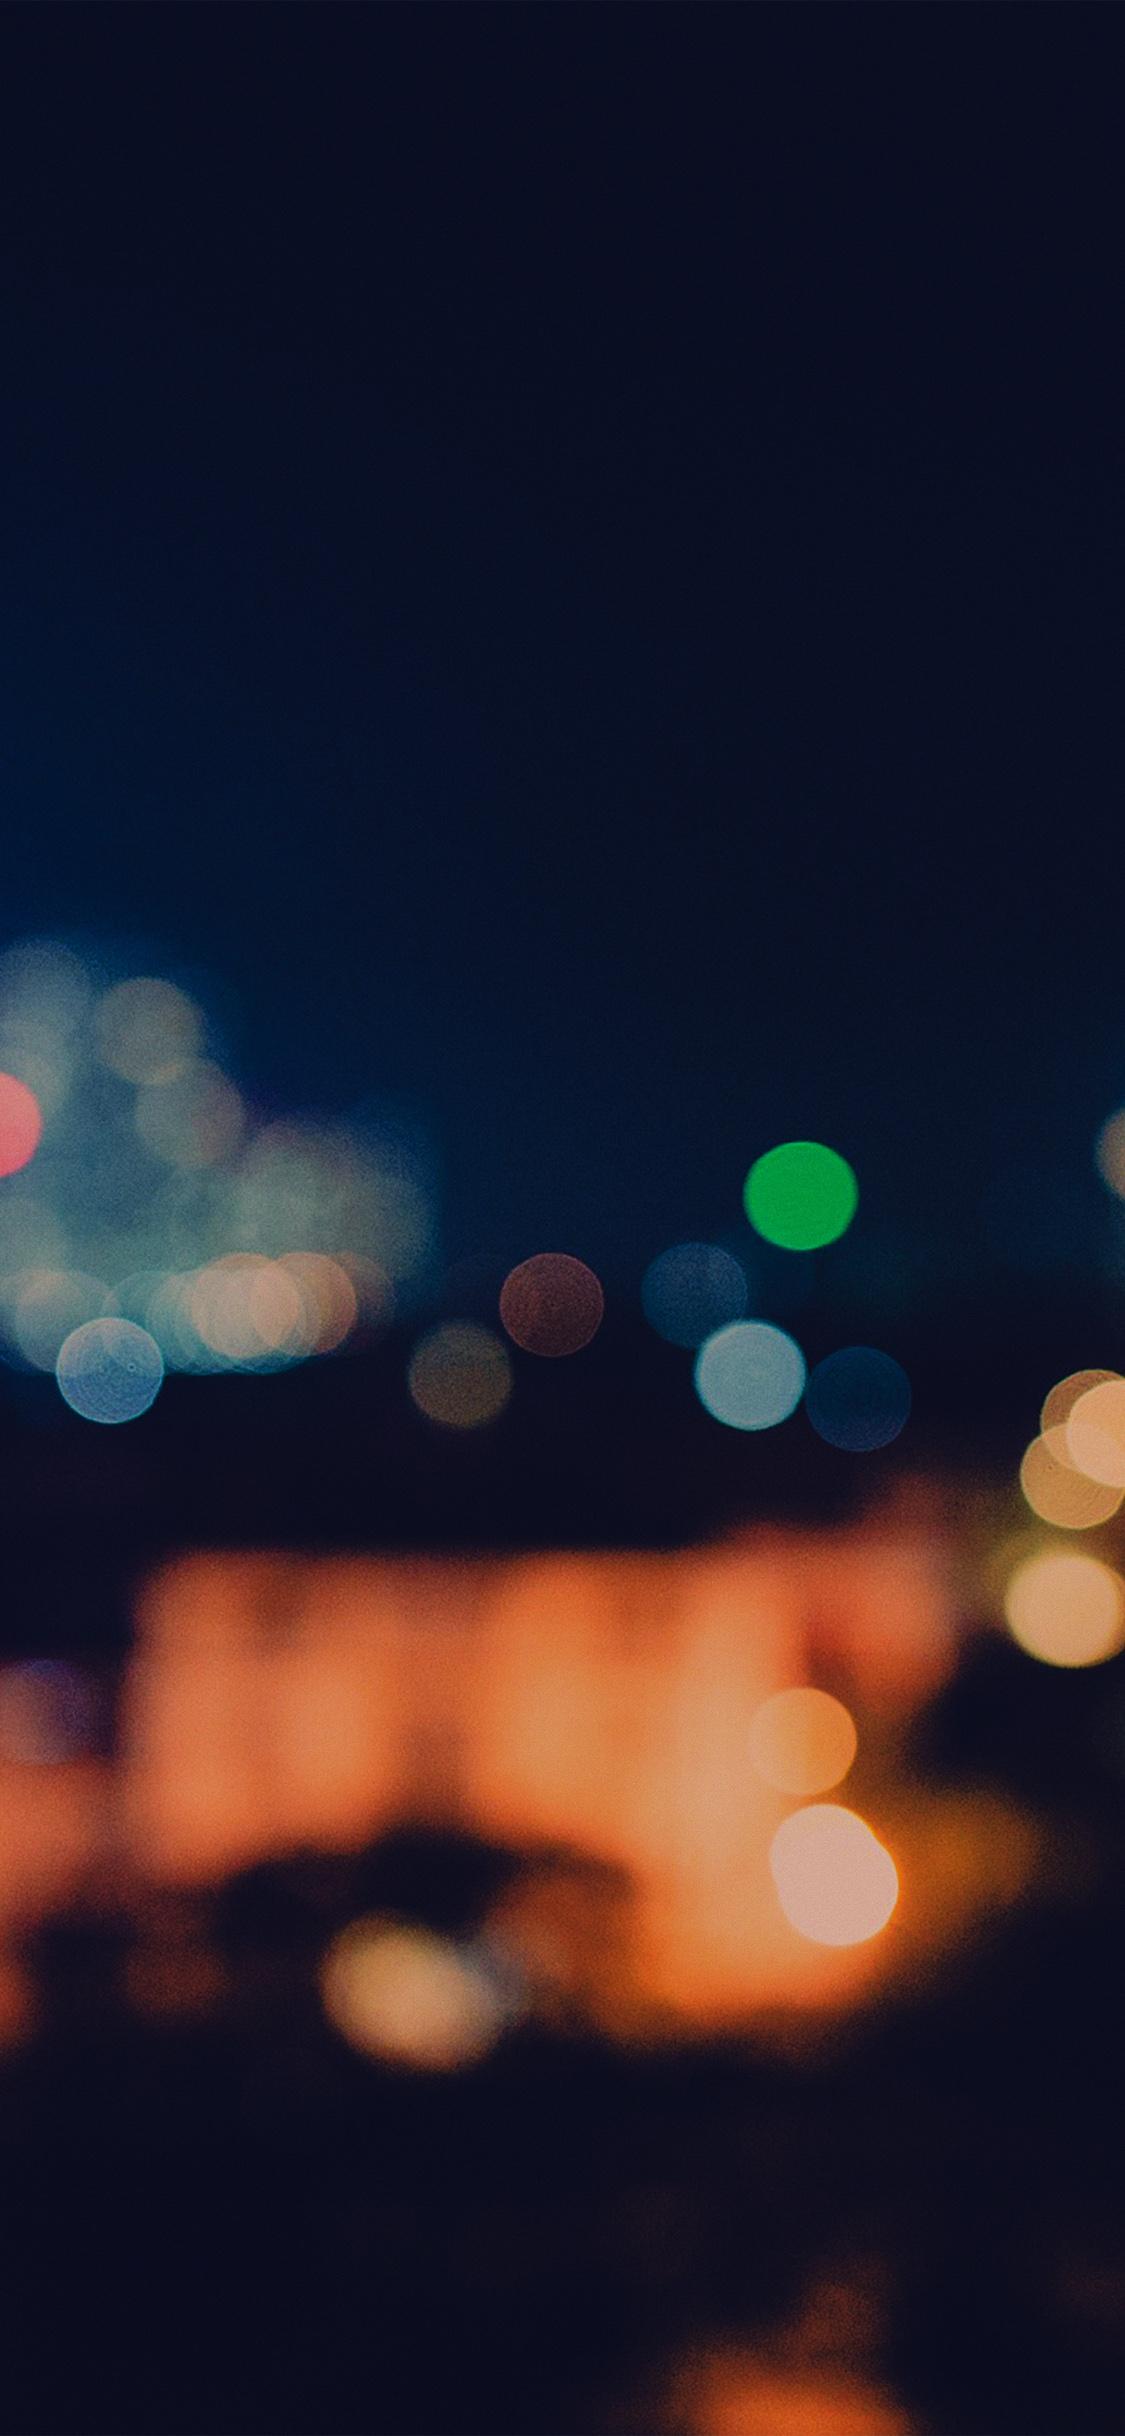 iPhoneXpapers.com-Apple-iPhone-wallpaper-vo06-bokeh-city-night-light-art-blue-pattern-dark